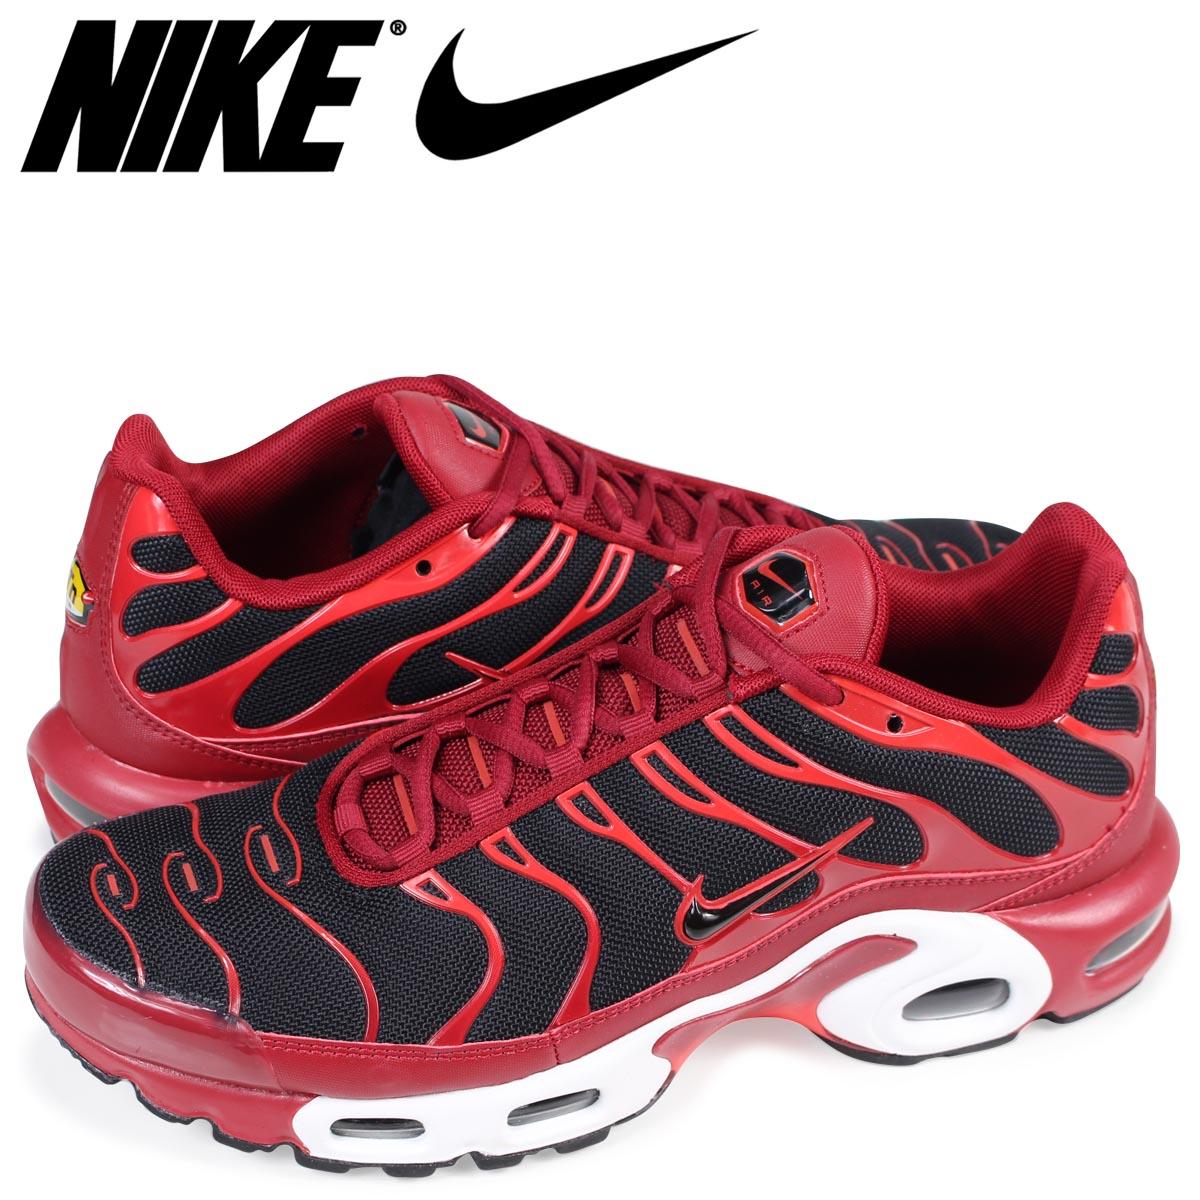 size 40 2d790 4a2d6 Nike NIKE Air Max plus sneakers AIR MAX PLUS 852,630-601 men's red